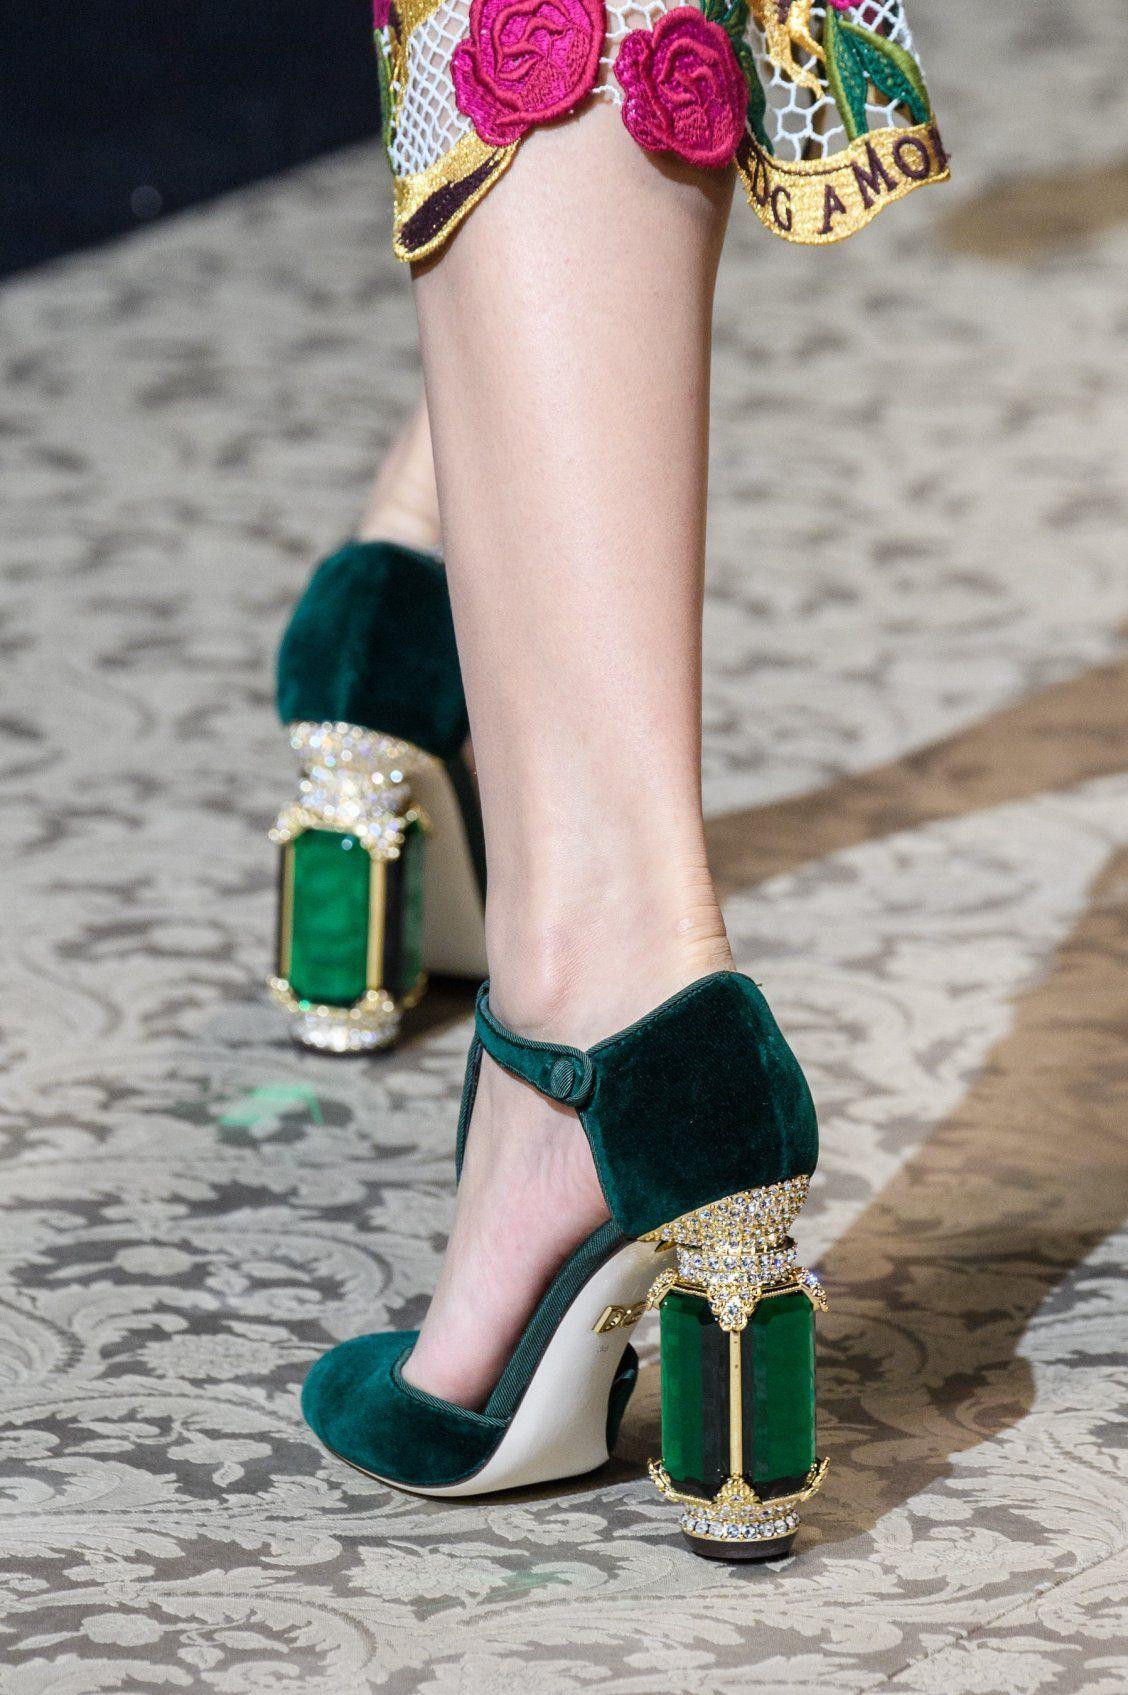 Cuir Chaussures De Sport Londres Printemps / Été Dolce & Gabbana g7pfBSMo